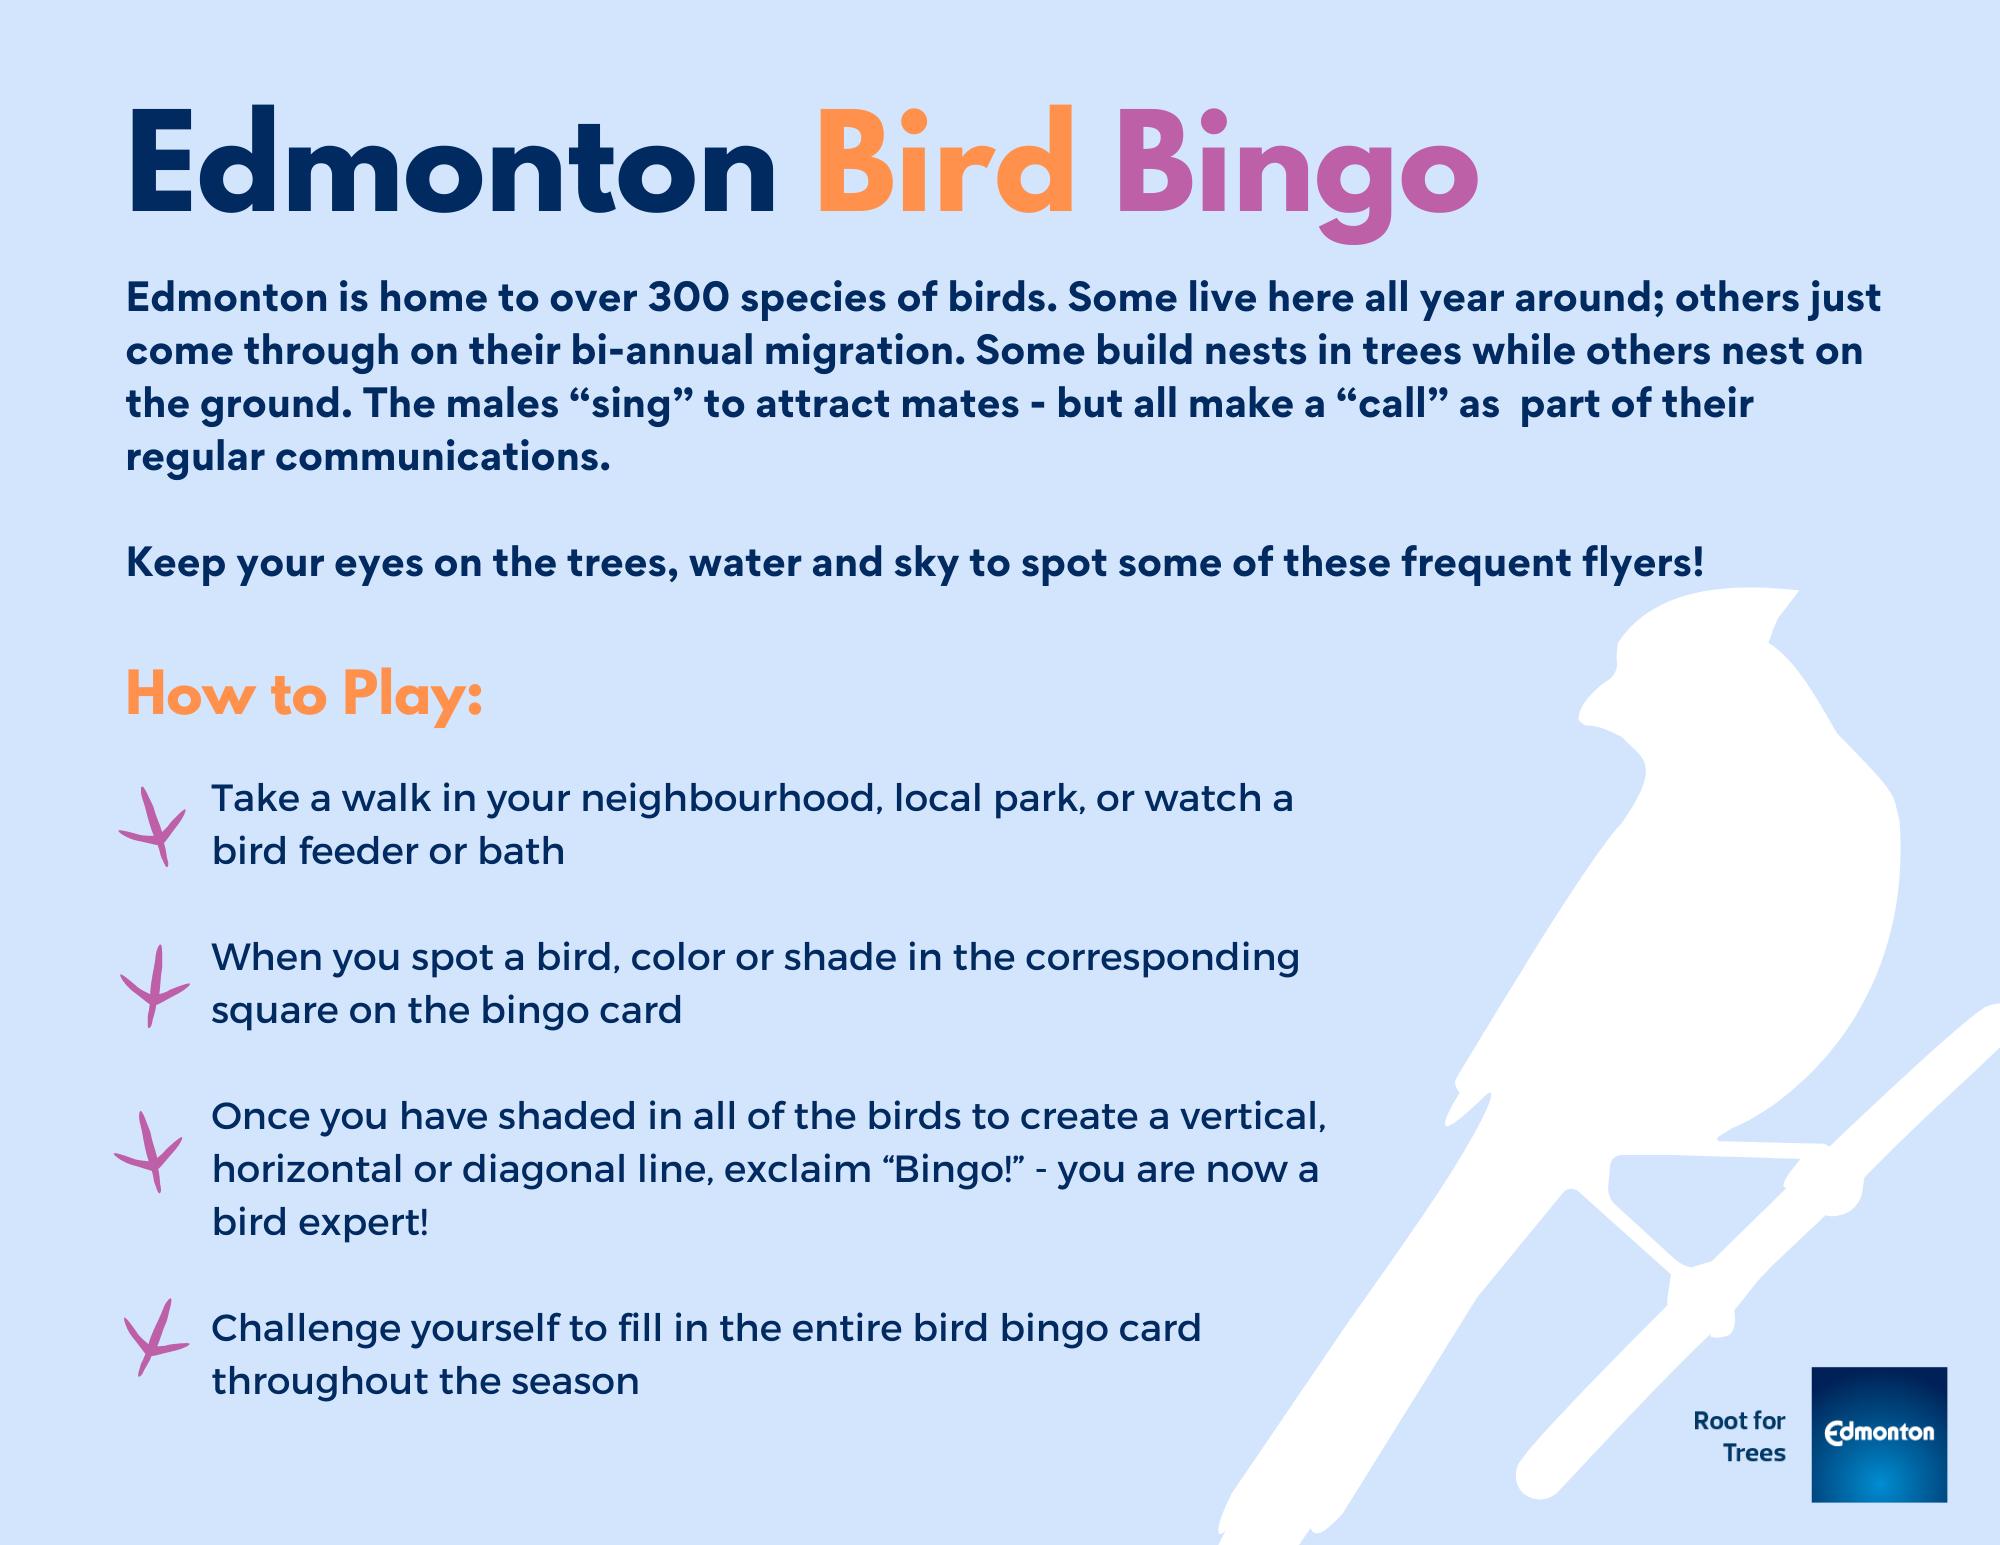 Edmonton Bird Bingo Instructions